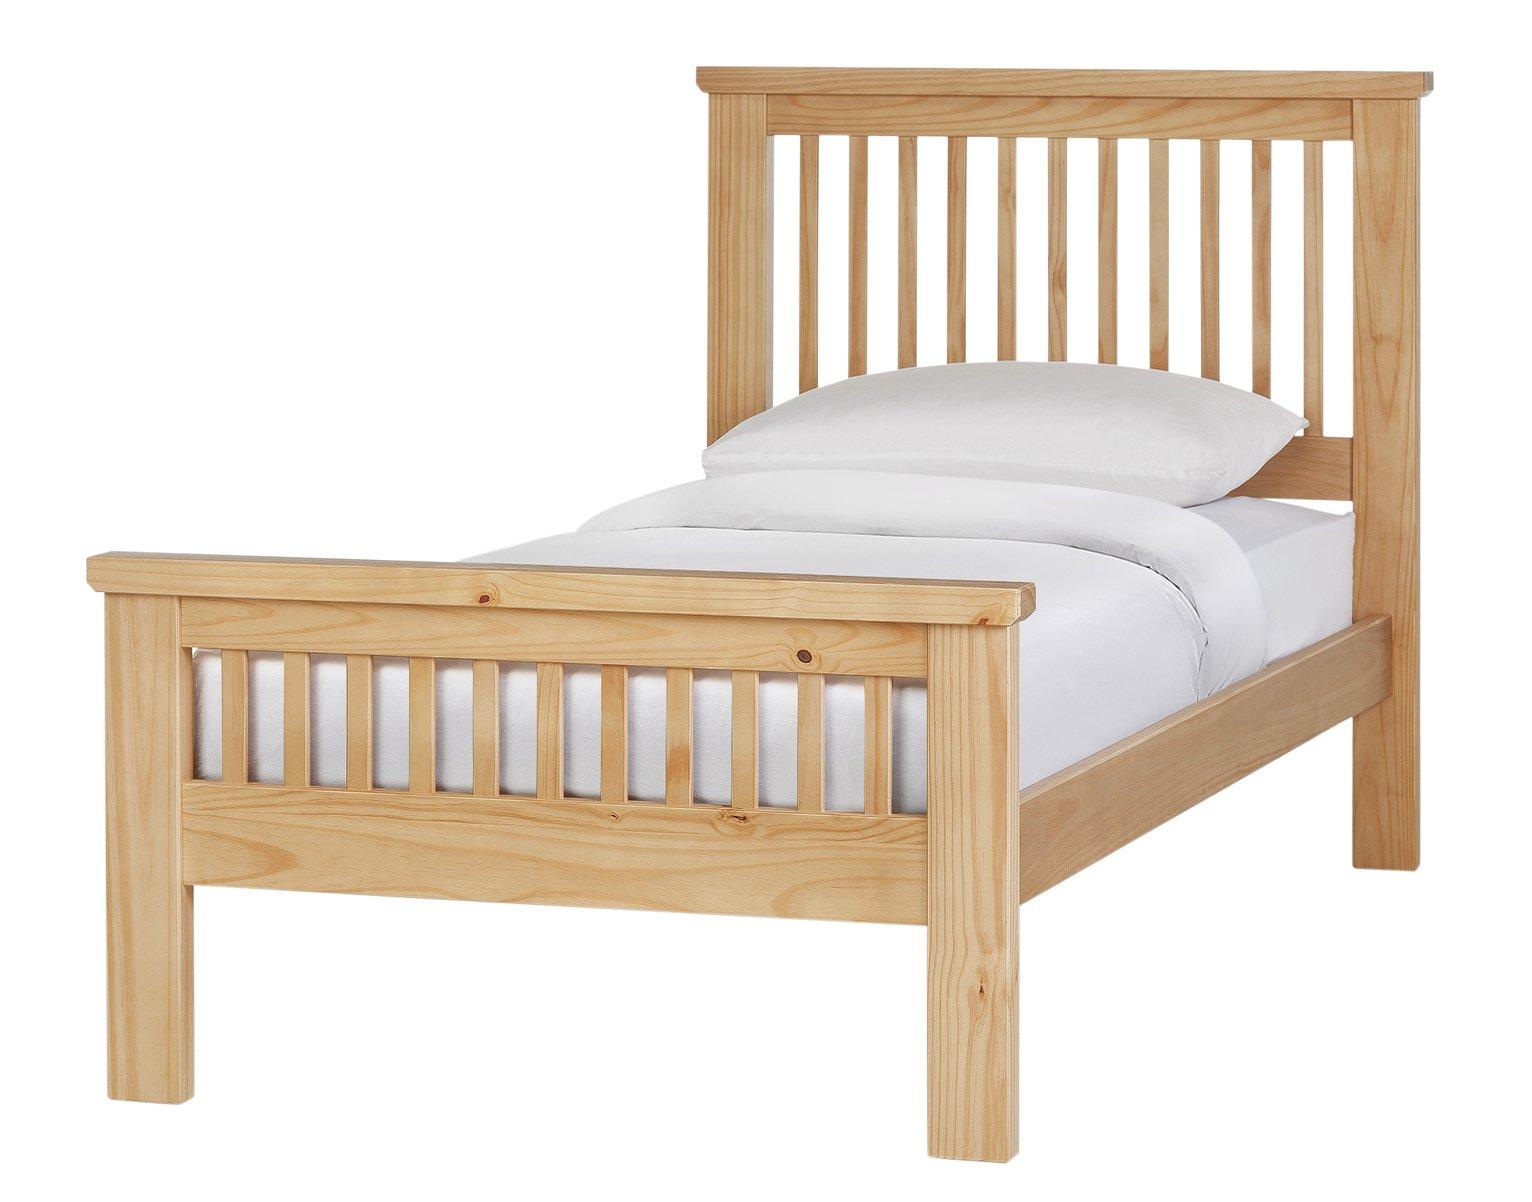 Argos Home Aubrey Single Bed Frame - Oak Stain